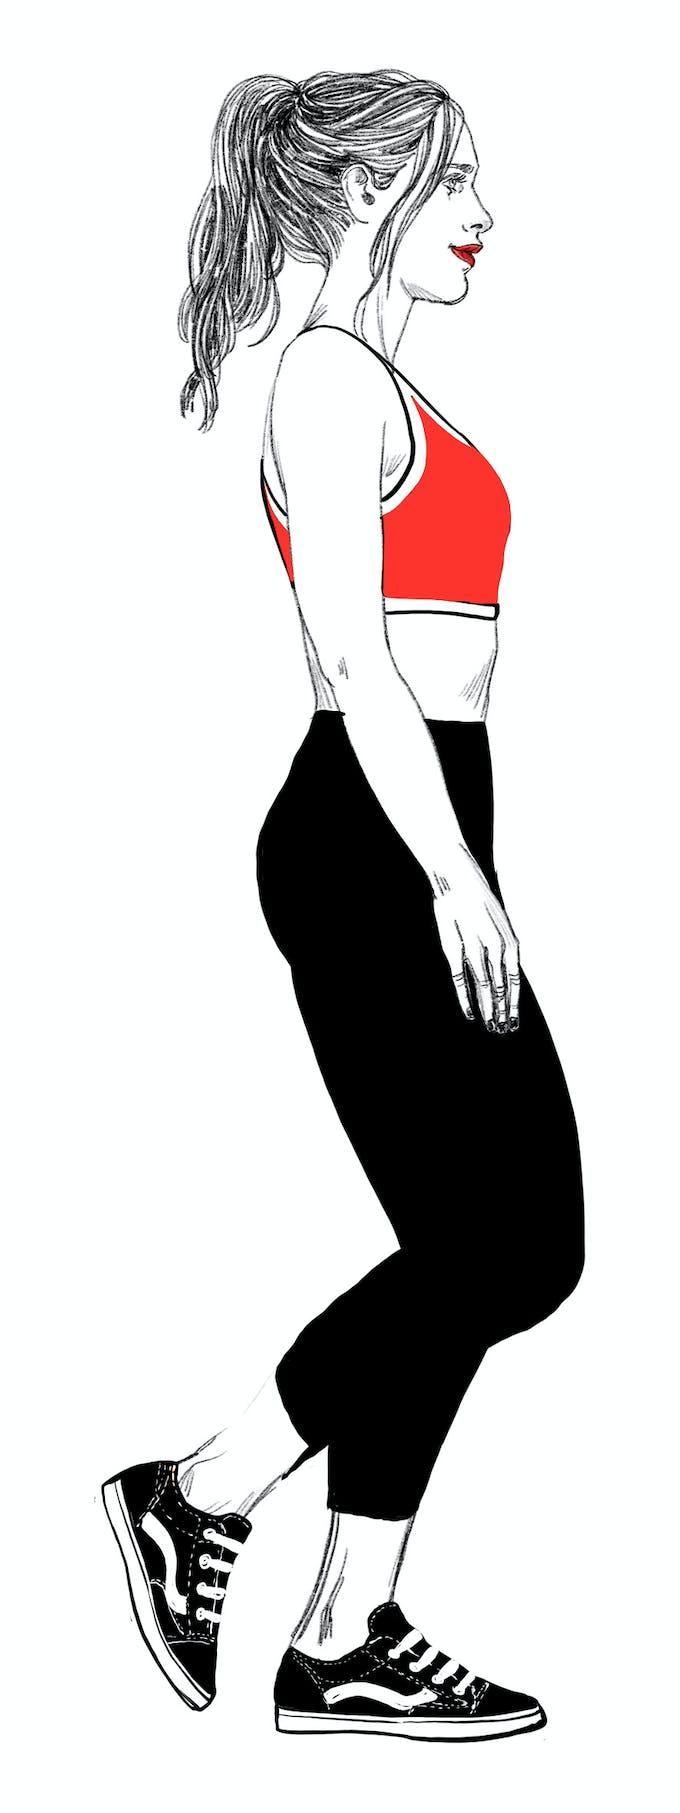 Renforcement musculaire tendinite du genou